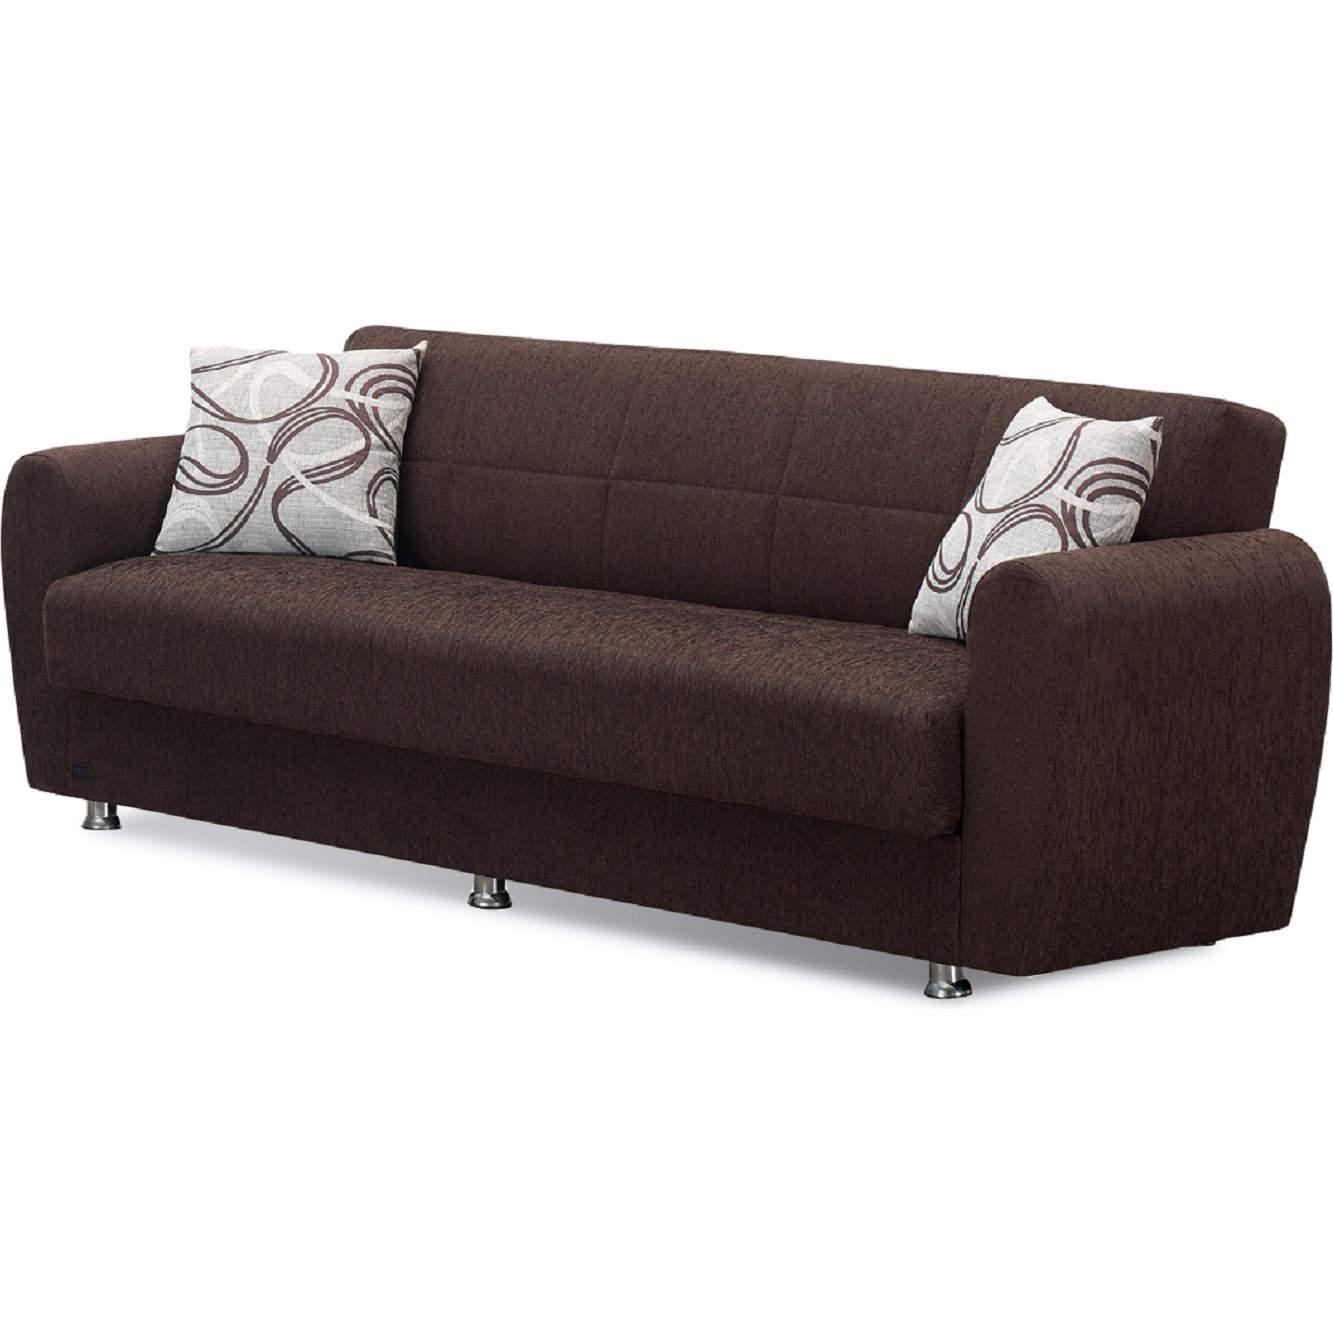 Boston Sleeper Sofa In Dark Brown Chenille By Empire Furniture